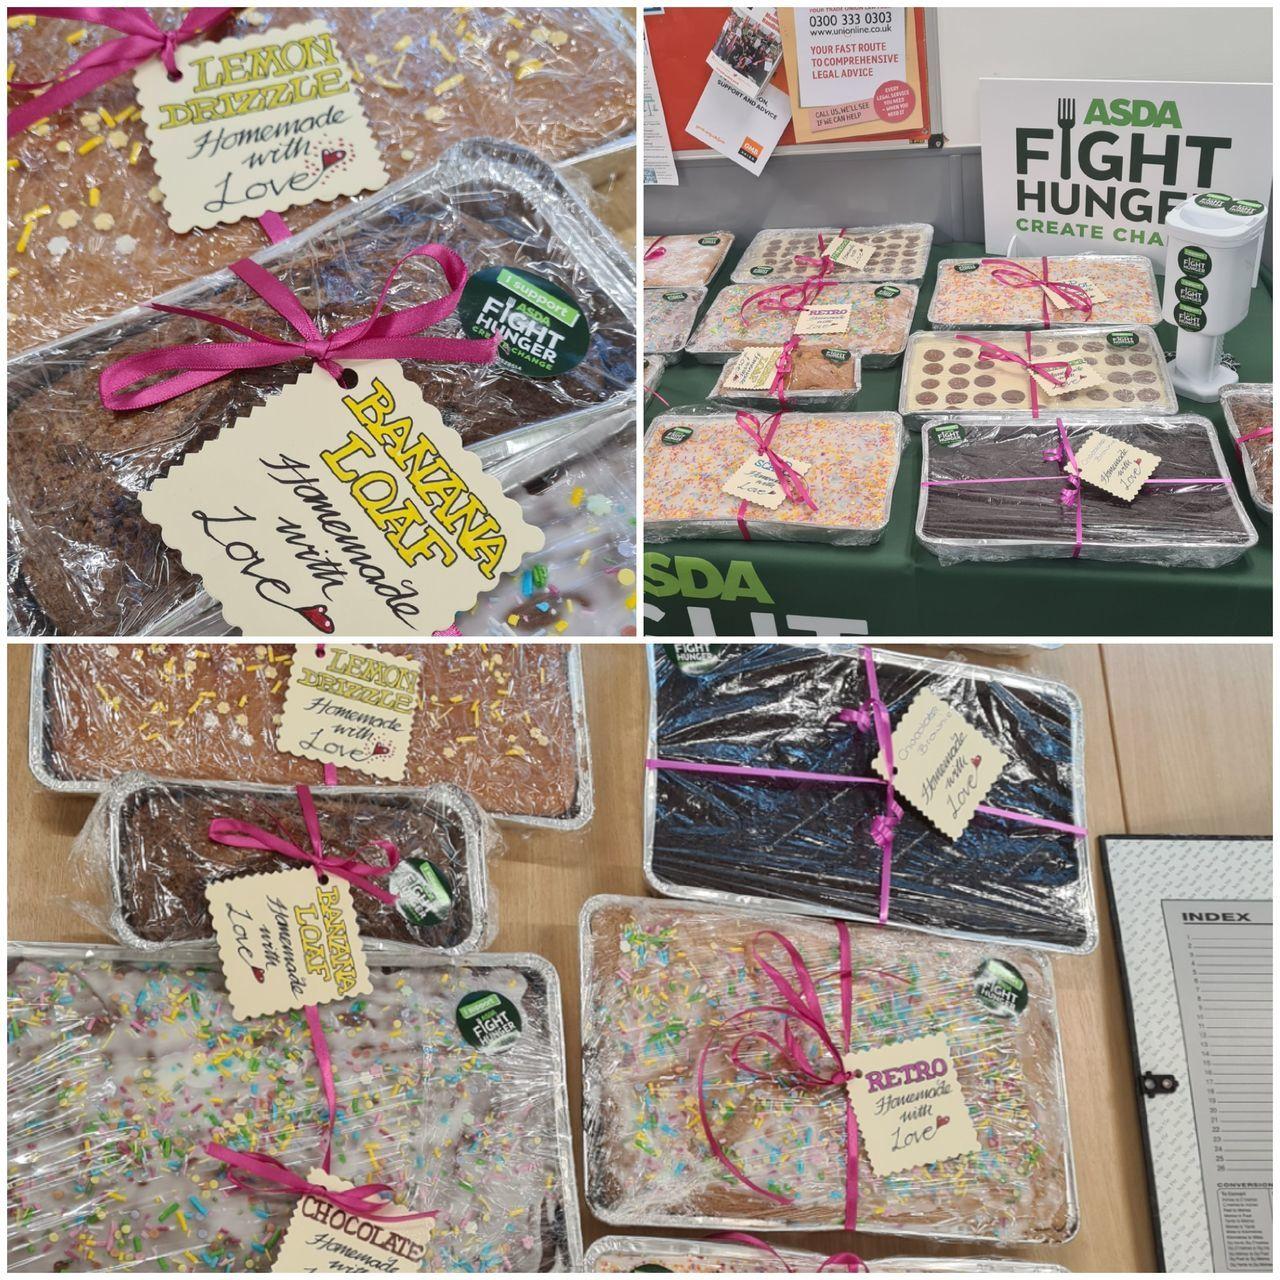 Fight Hunger | Asda Newport Isle of Wight